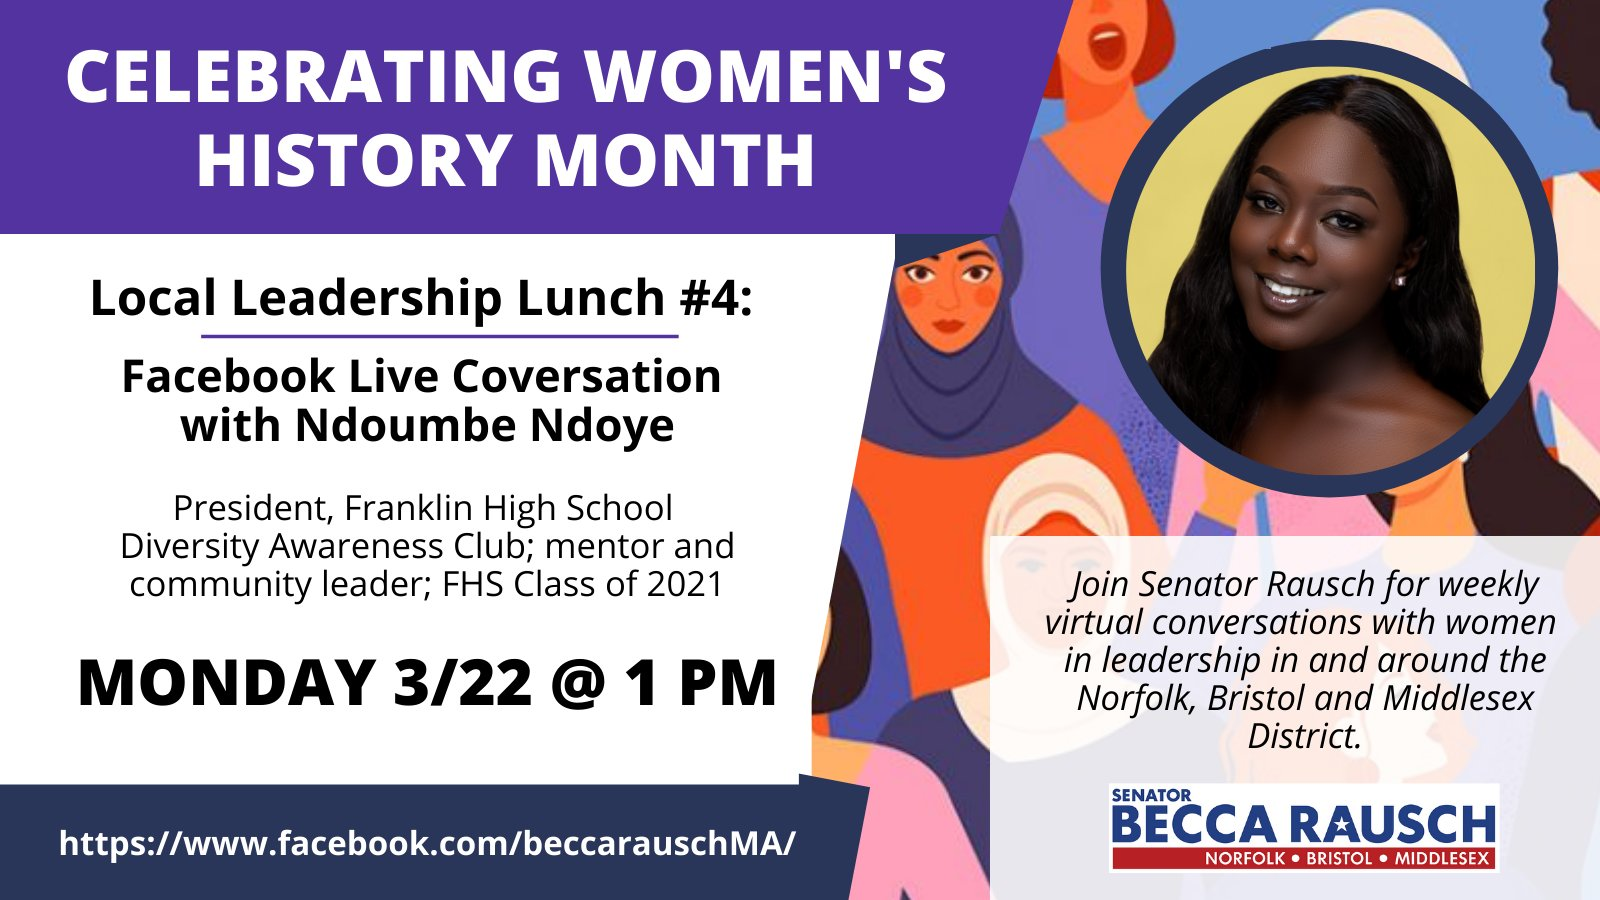 4th Local Leadership Lunch with Ndoumbe Ndoye - Mar 26 - 1:00 PM